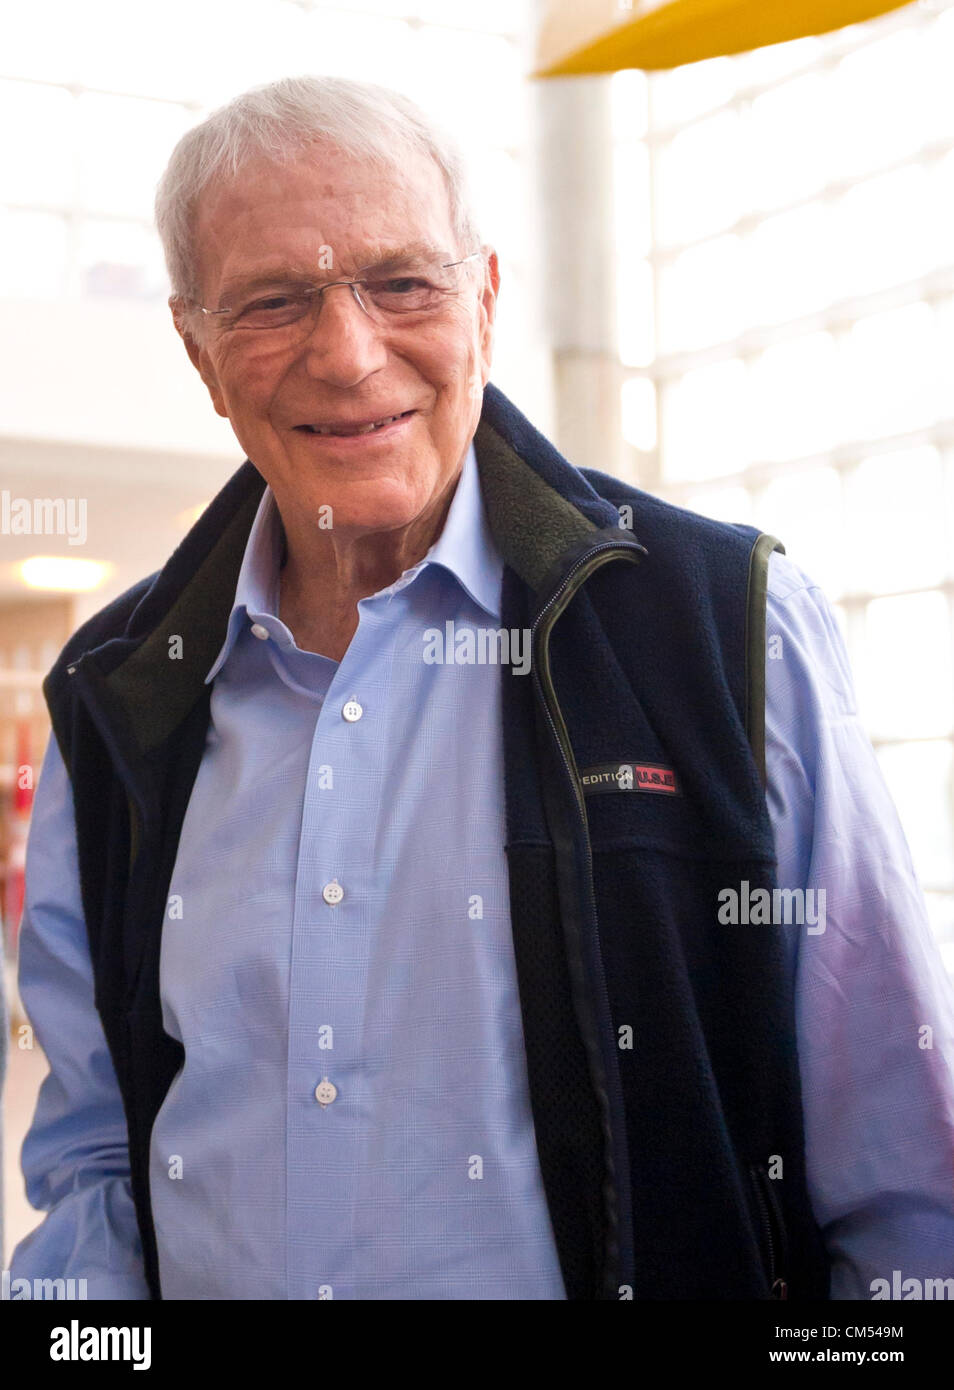 Oct 4, 2012 - GARDEN CITY, NEW YORK U.S. - Mercury astronaut SCOTT CARPENTER is a special guest at the new JetBlue - Stock Image